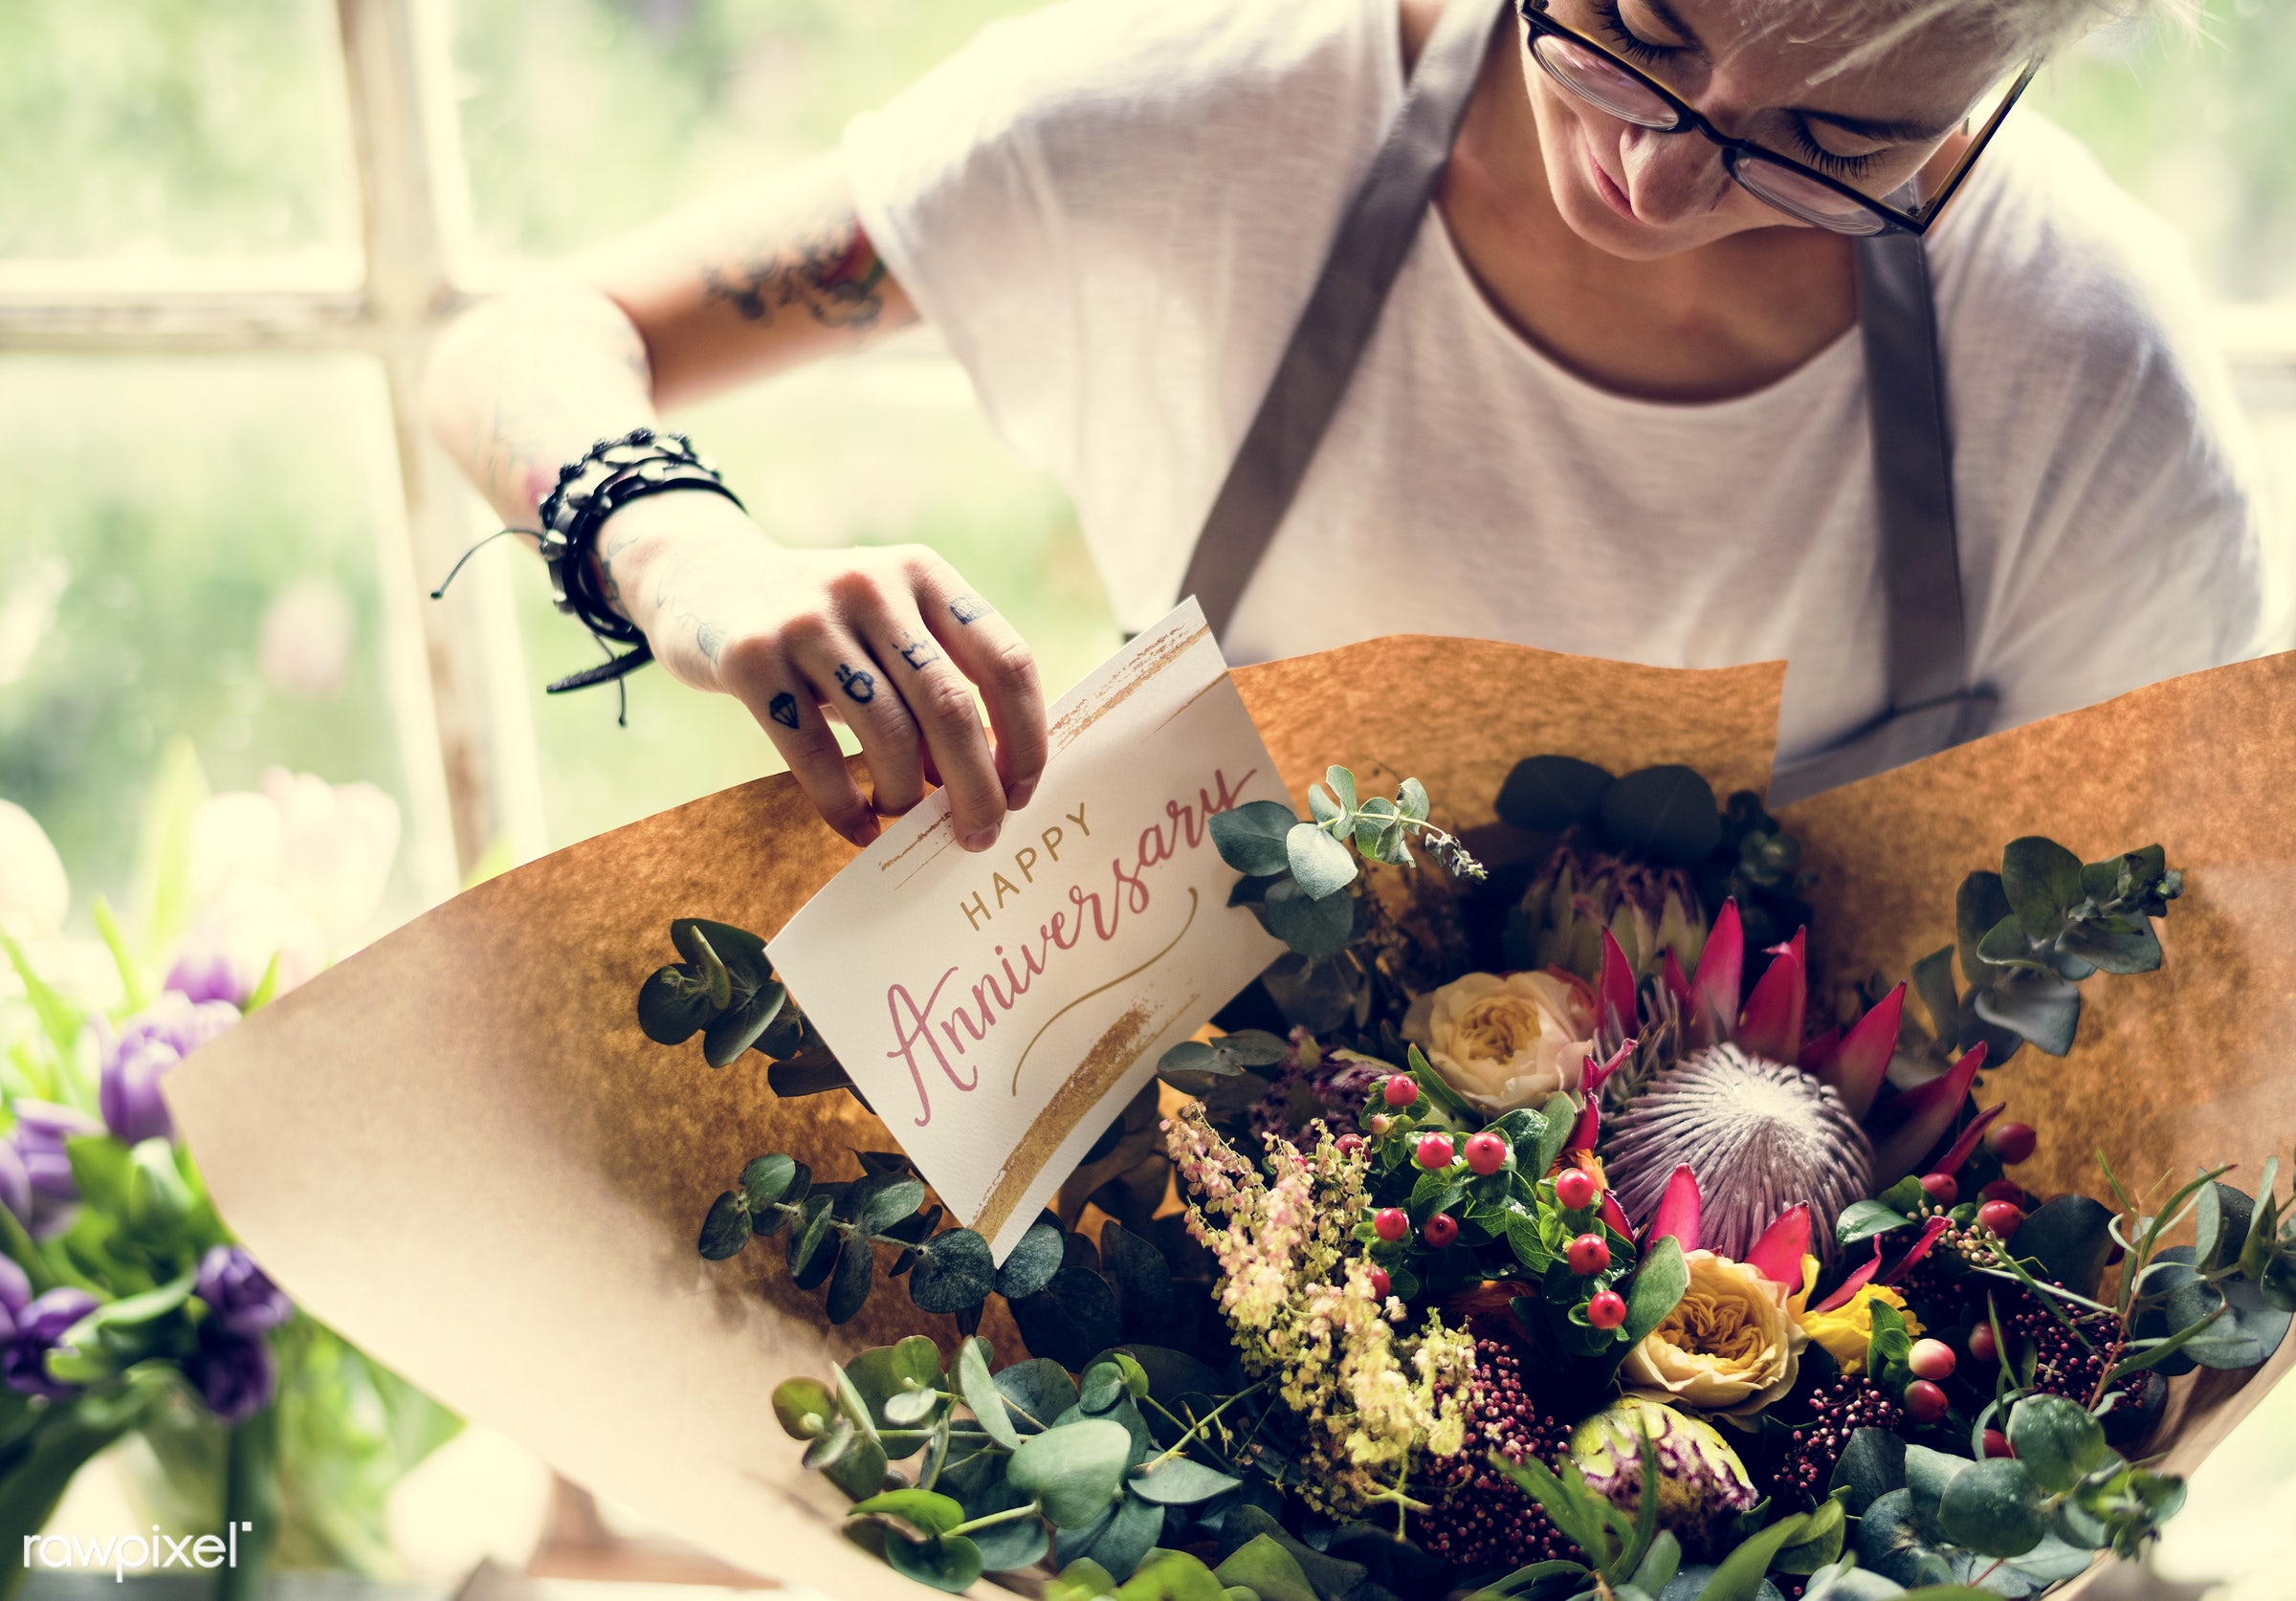 shop, bouquet, detail, person, people, decor, nature, card, flowers, work, refreshment, hold, career, florist, present,...